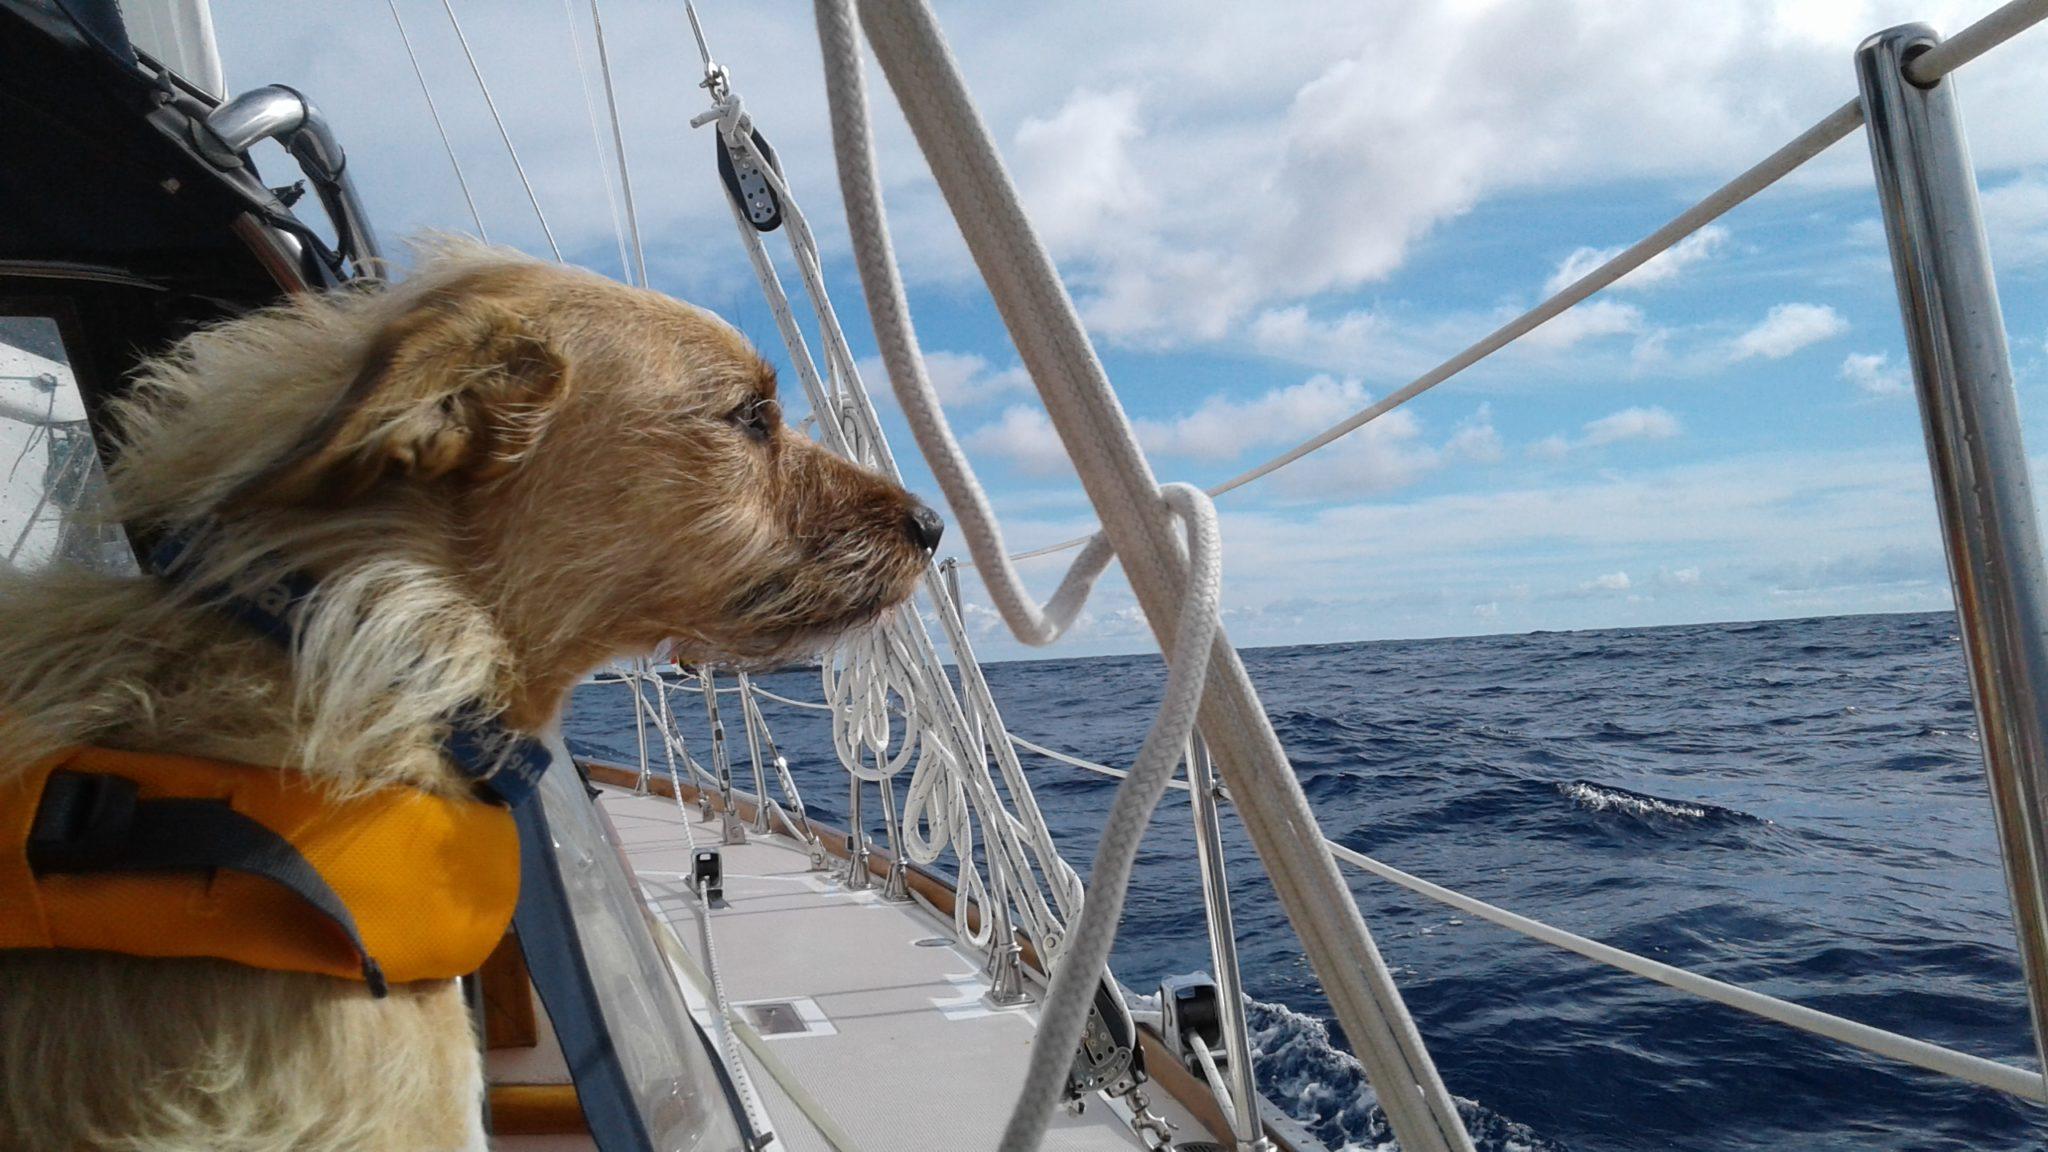 Salty Dawg Sailing Association™ Announces Summer Rallies to Maine and Nova Scotia